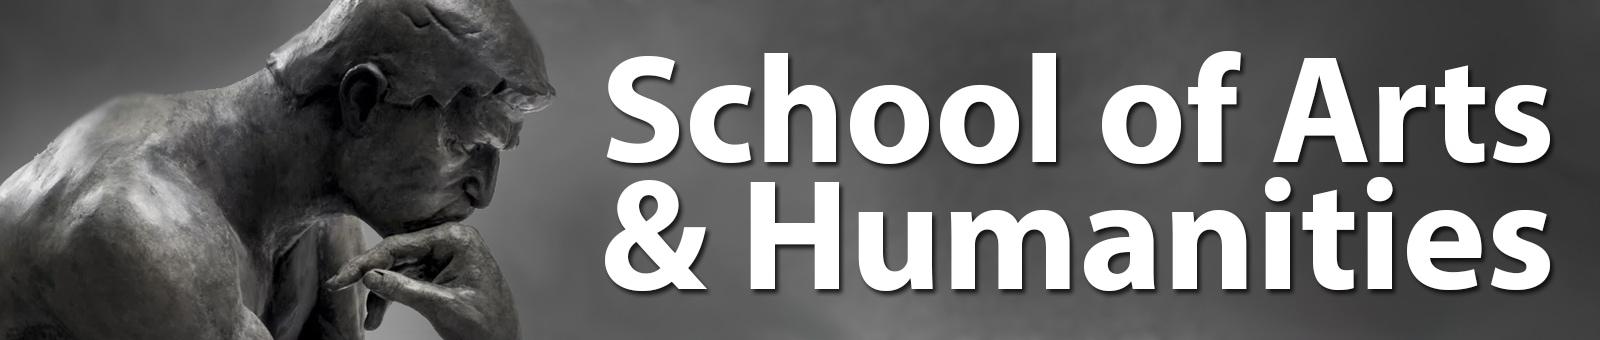 School of Arts and Humanities